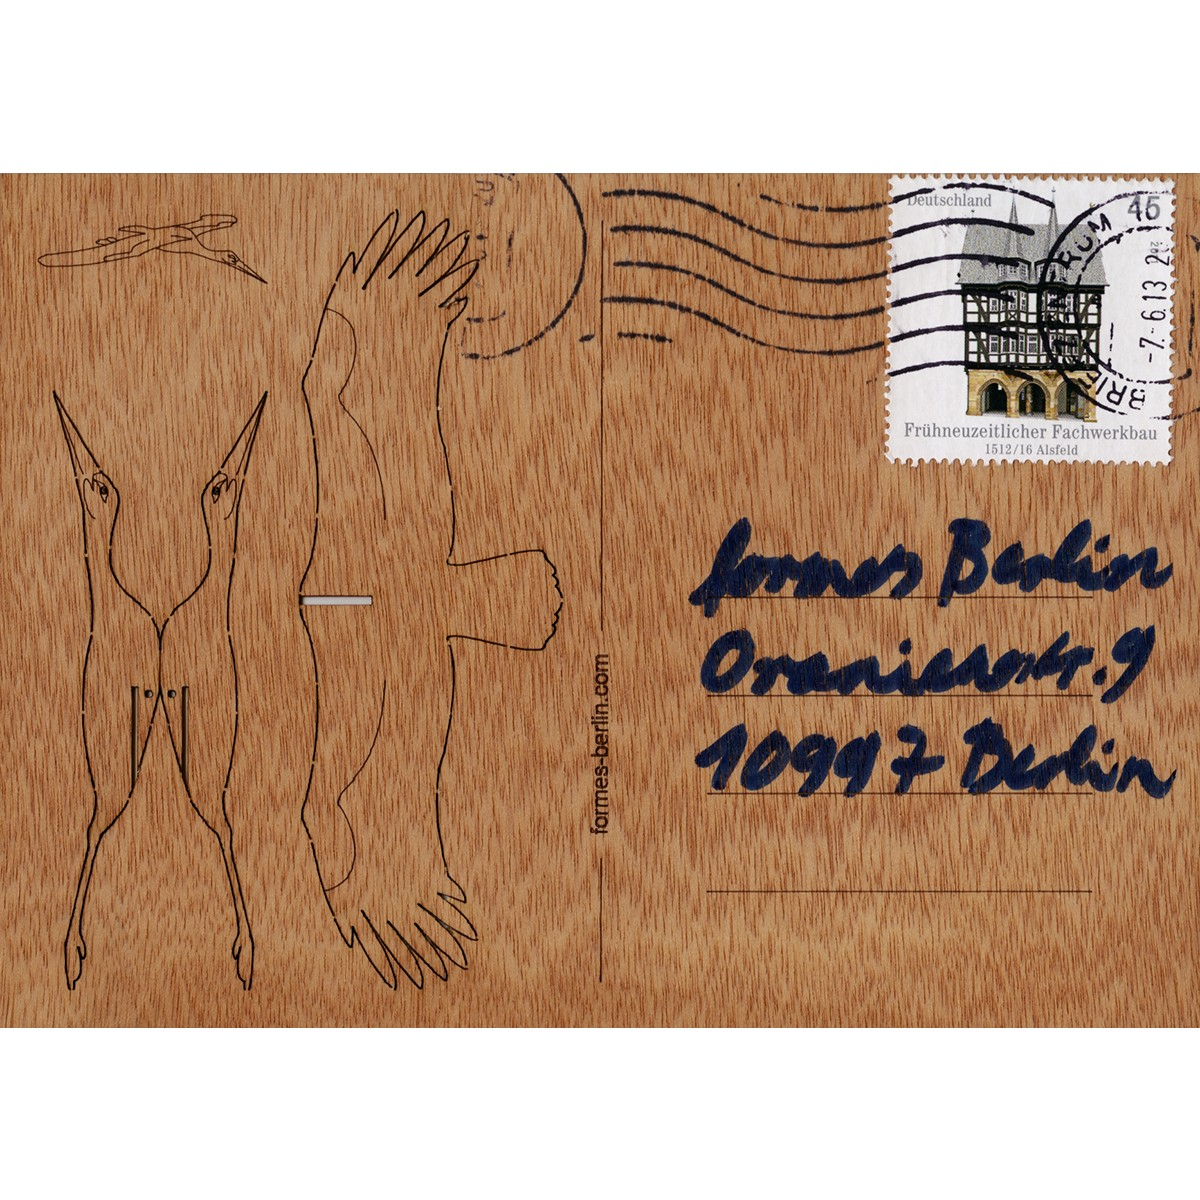 formes Berlin Storch-Karten - 6 Postkarten aus Holz